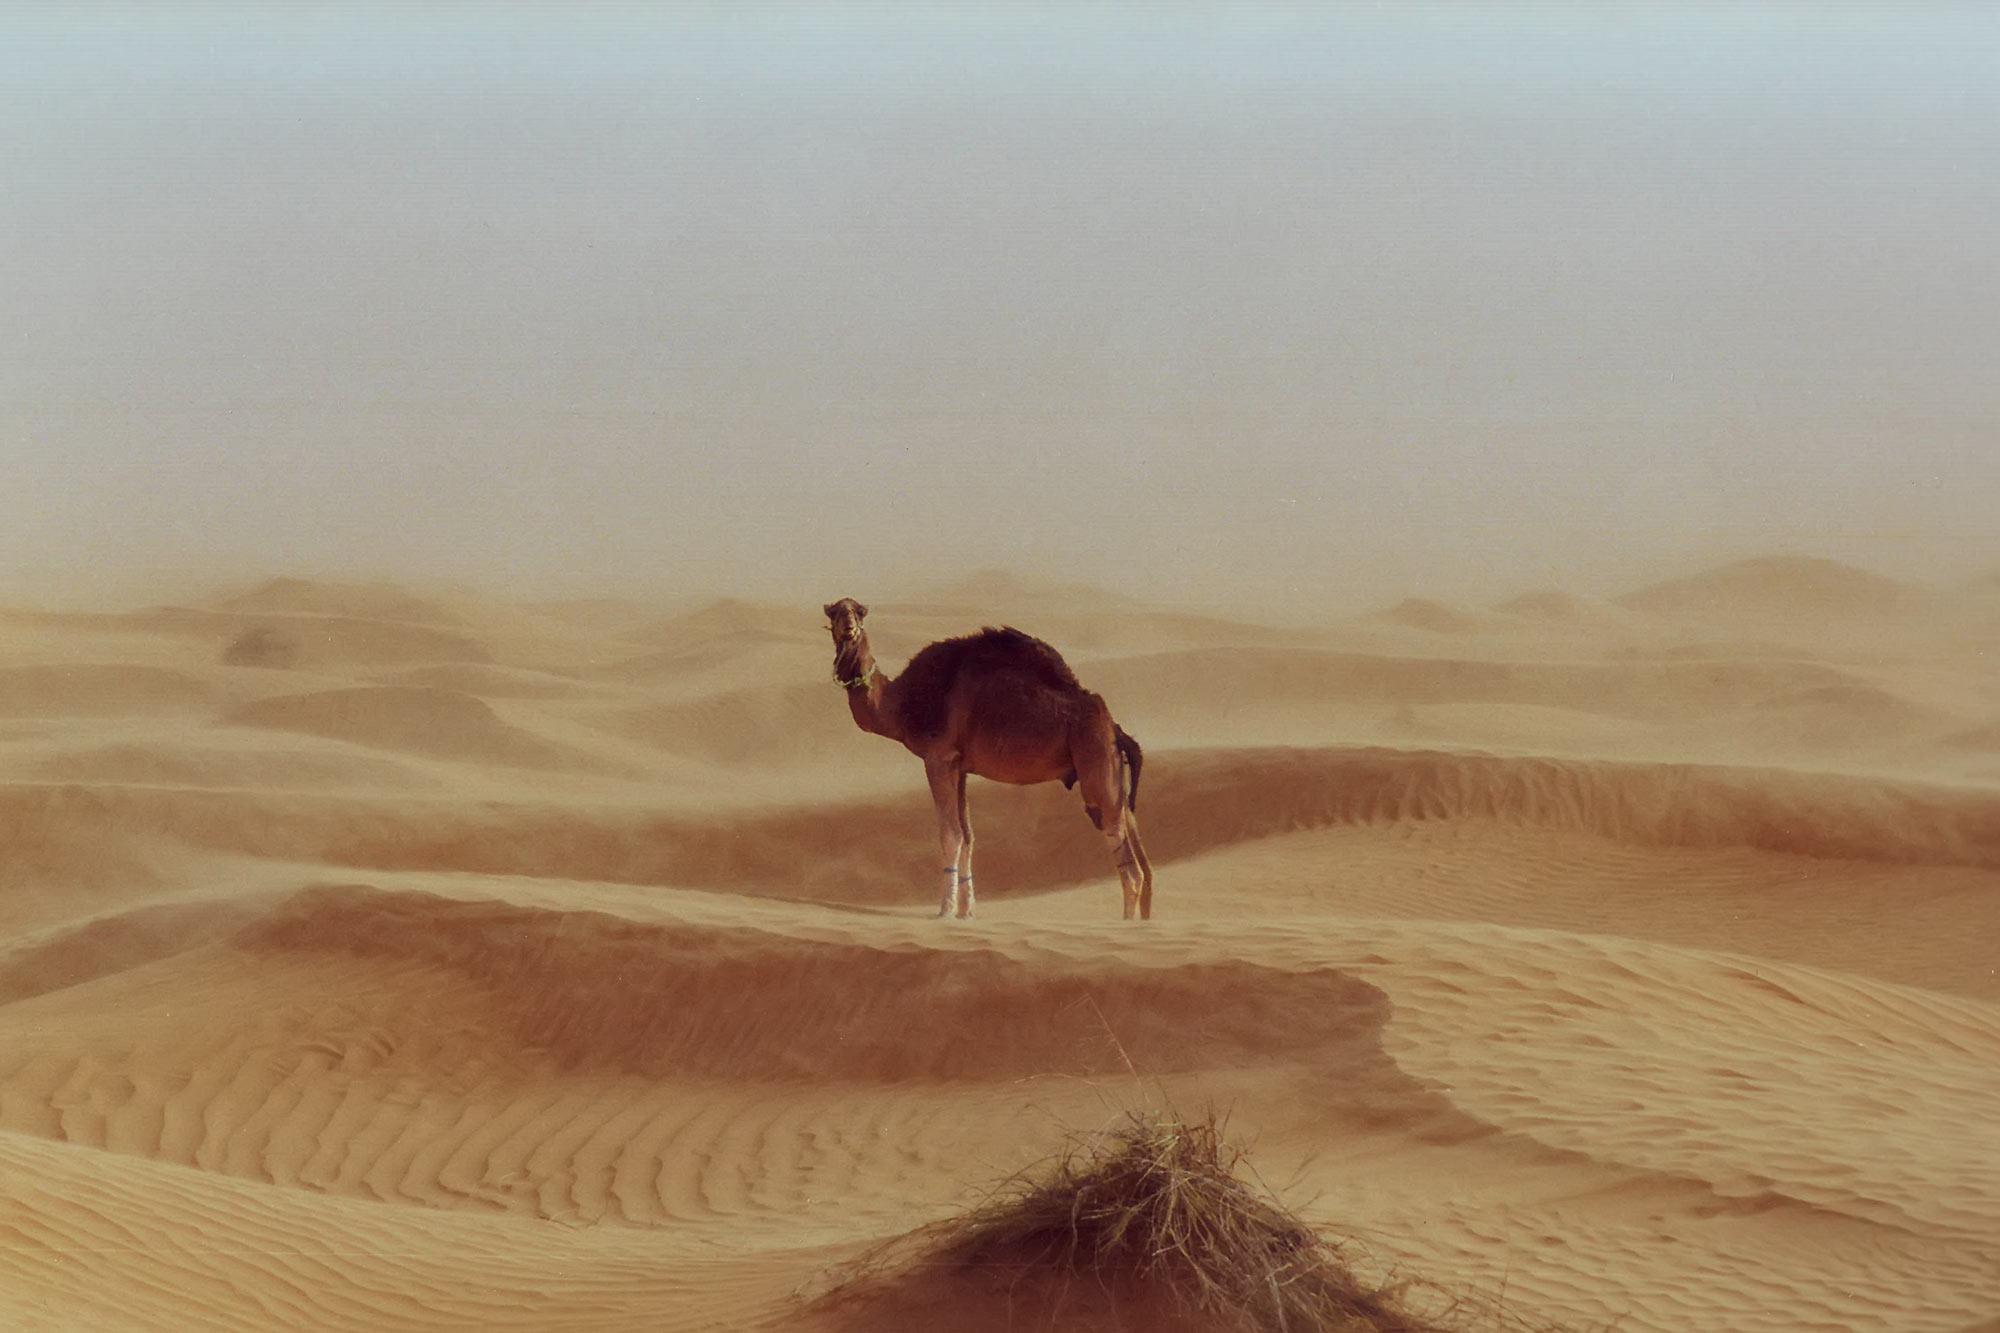 camel-tunisia-desert-sahara-africa